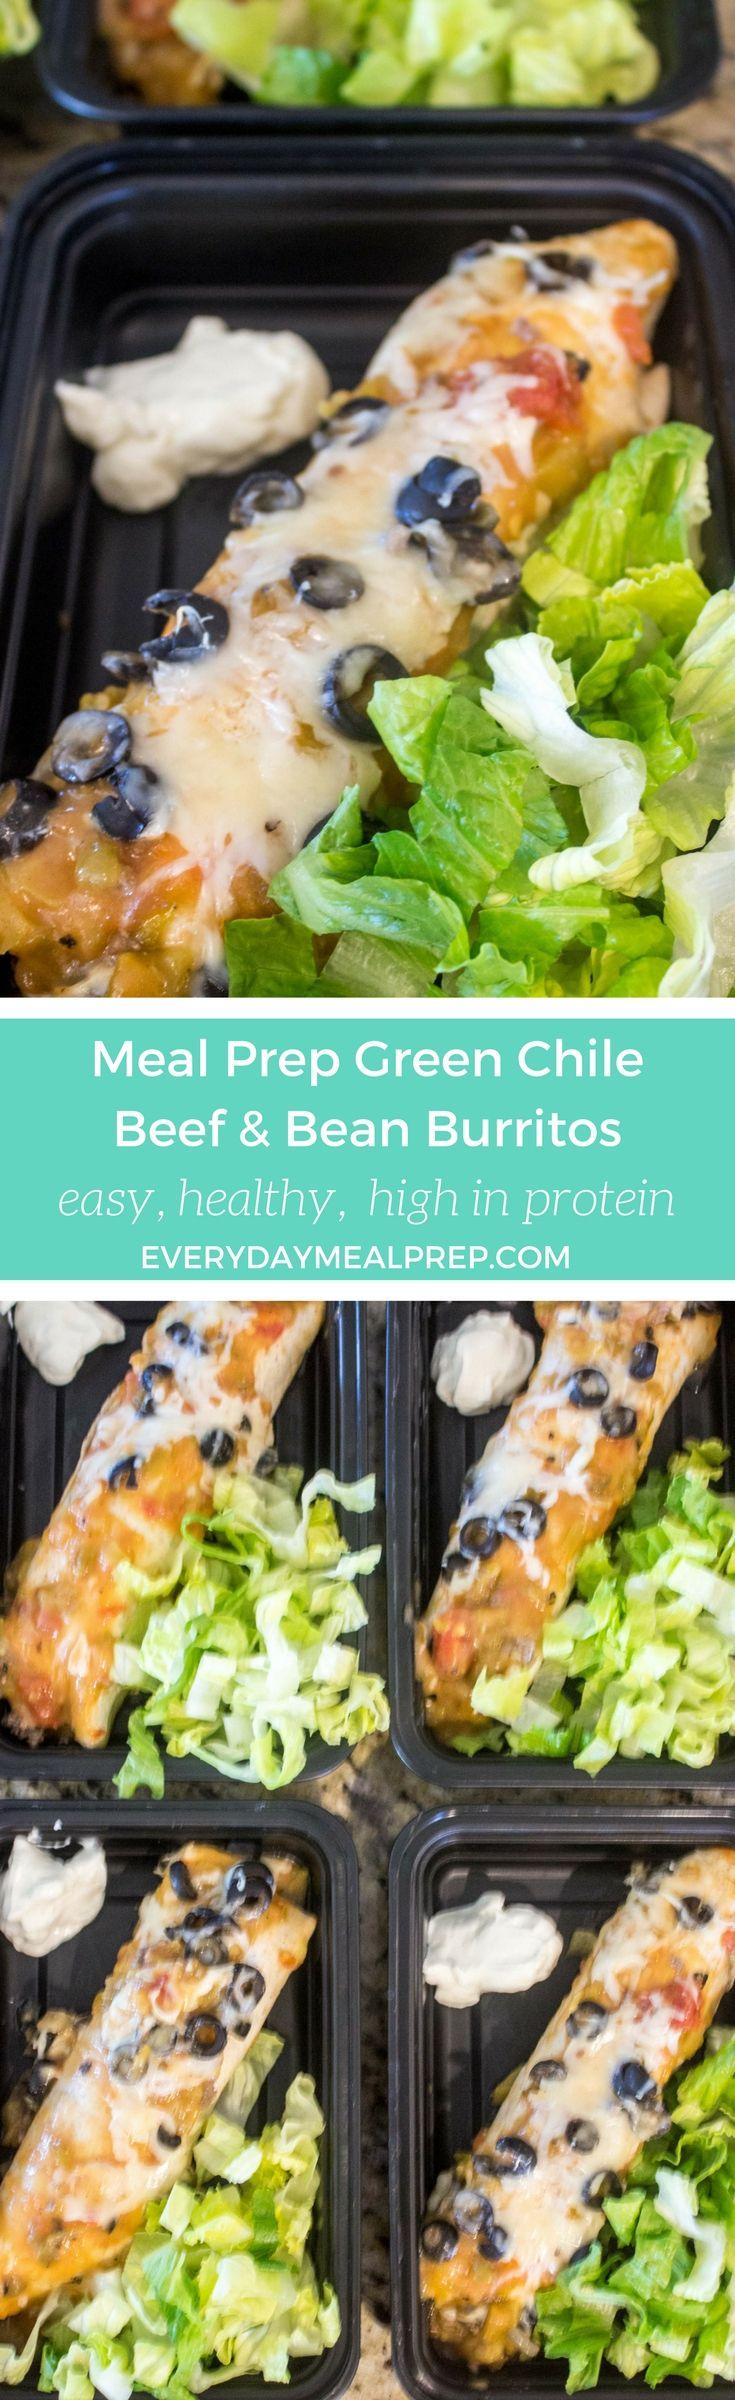 Meal Prep Green Chile Beef & Bean Burritos